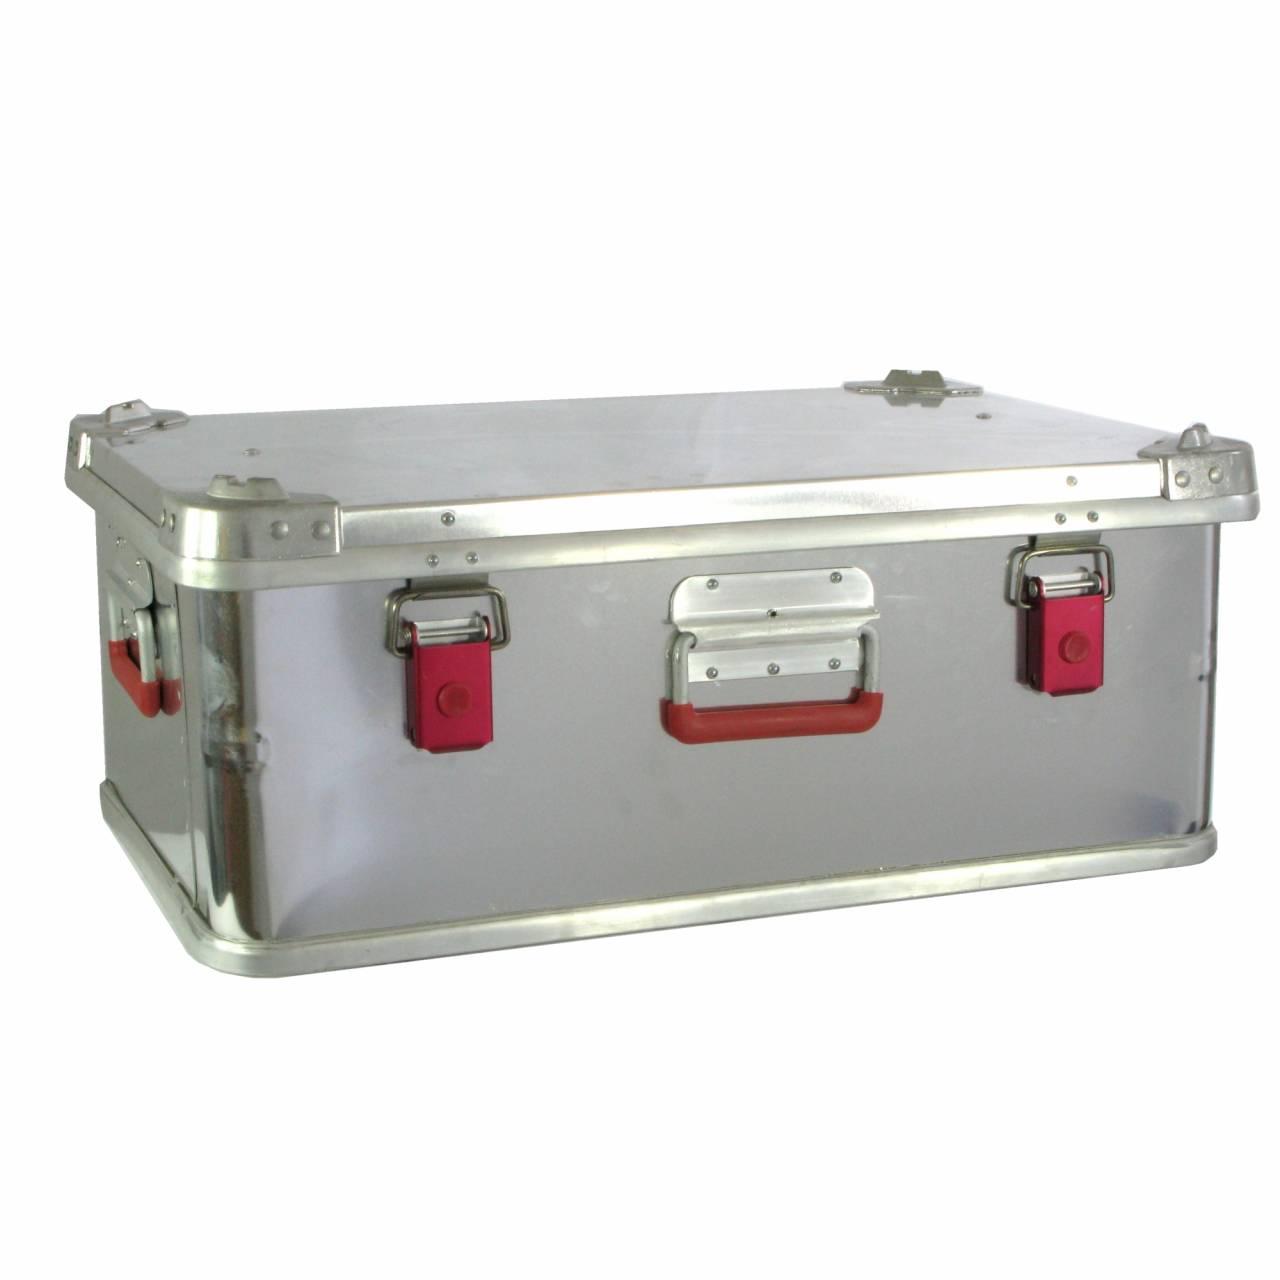 Alu-Werkzeugbox Gr.5, 845 x 620 x 400 mm